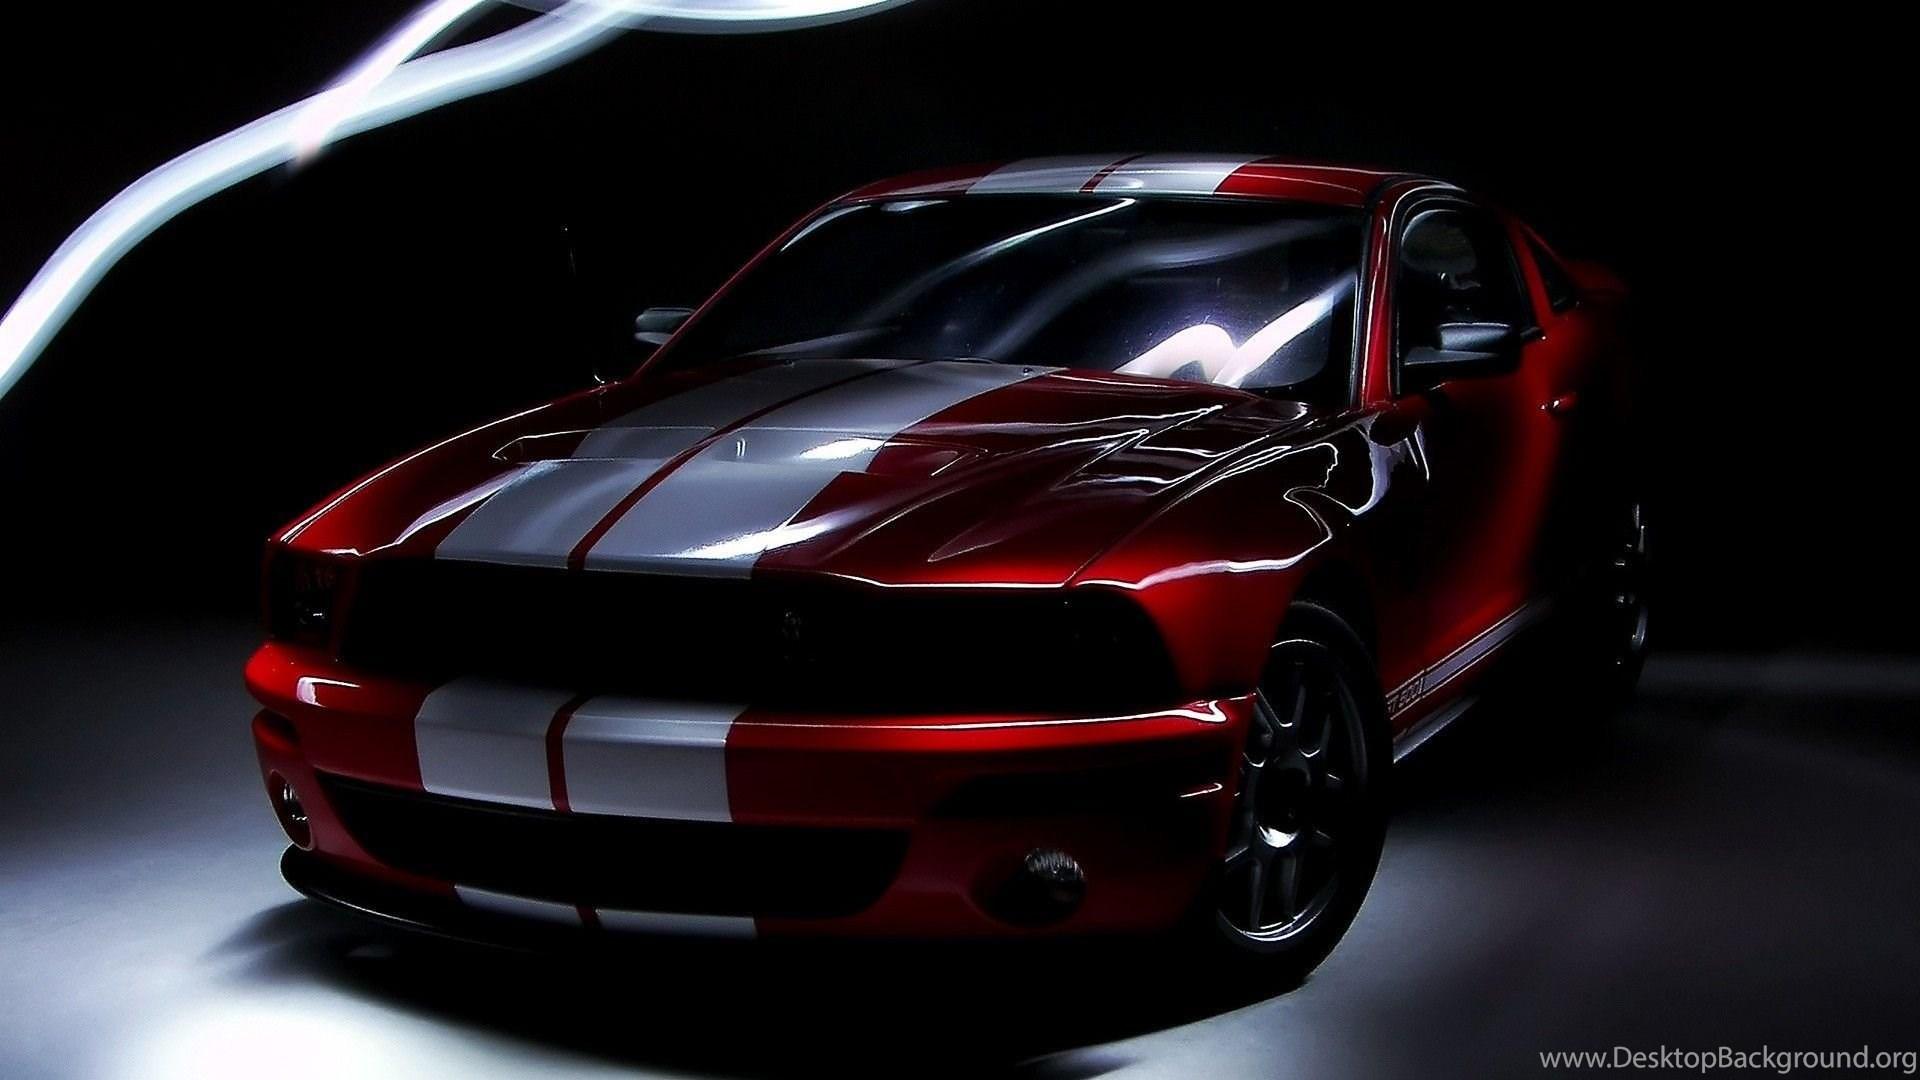 Black Ford Mustang Gt Wallpapers Desktop Background